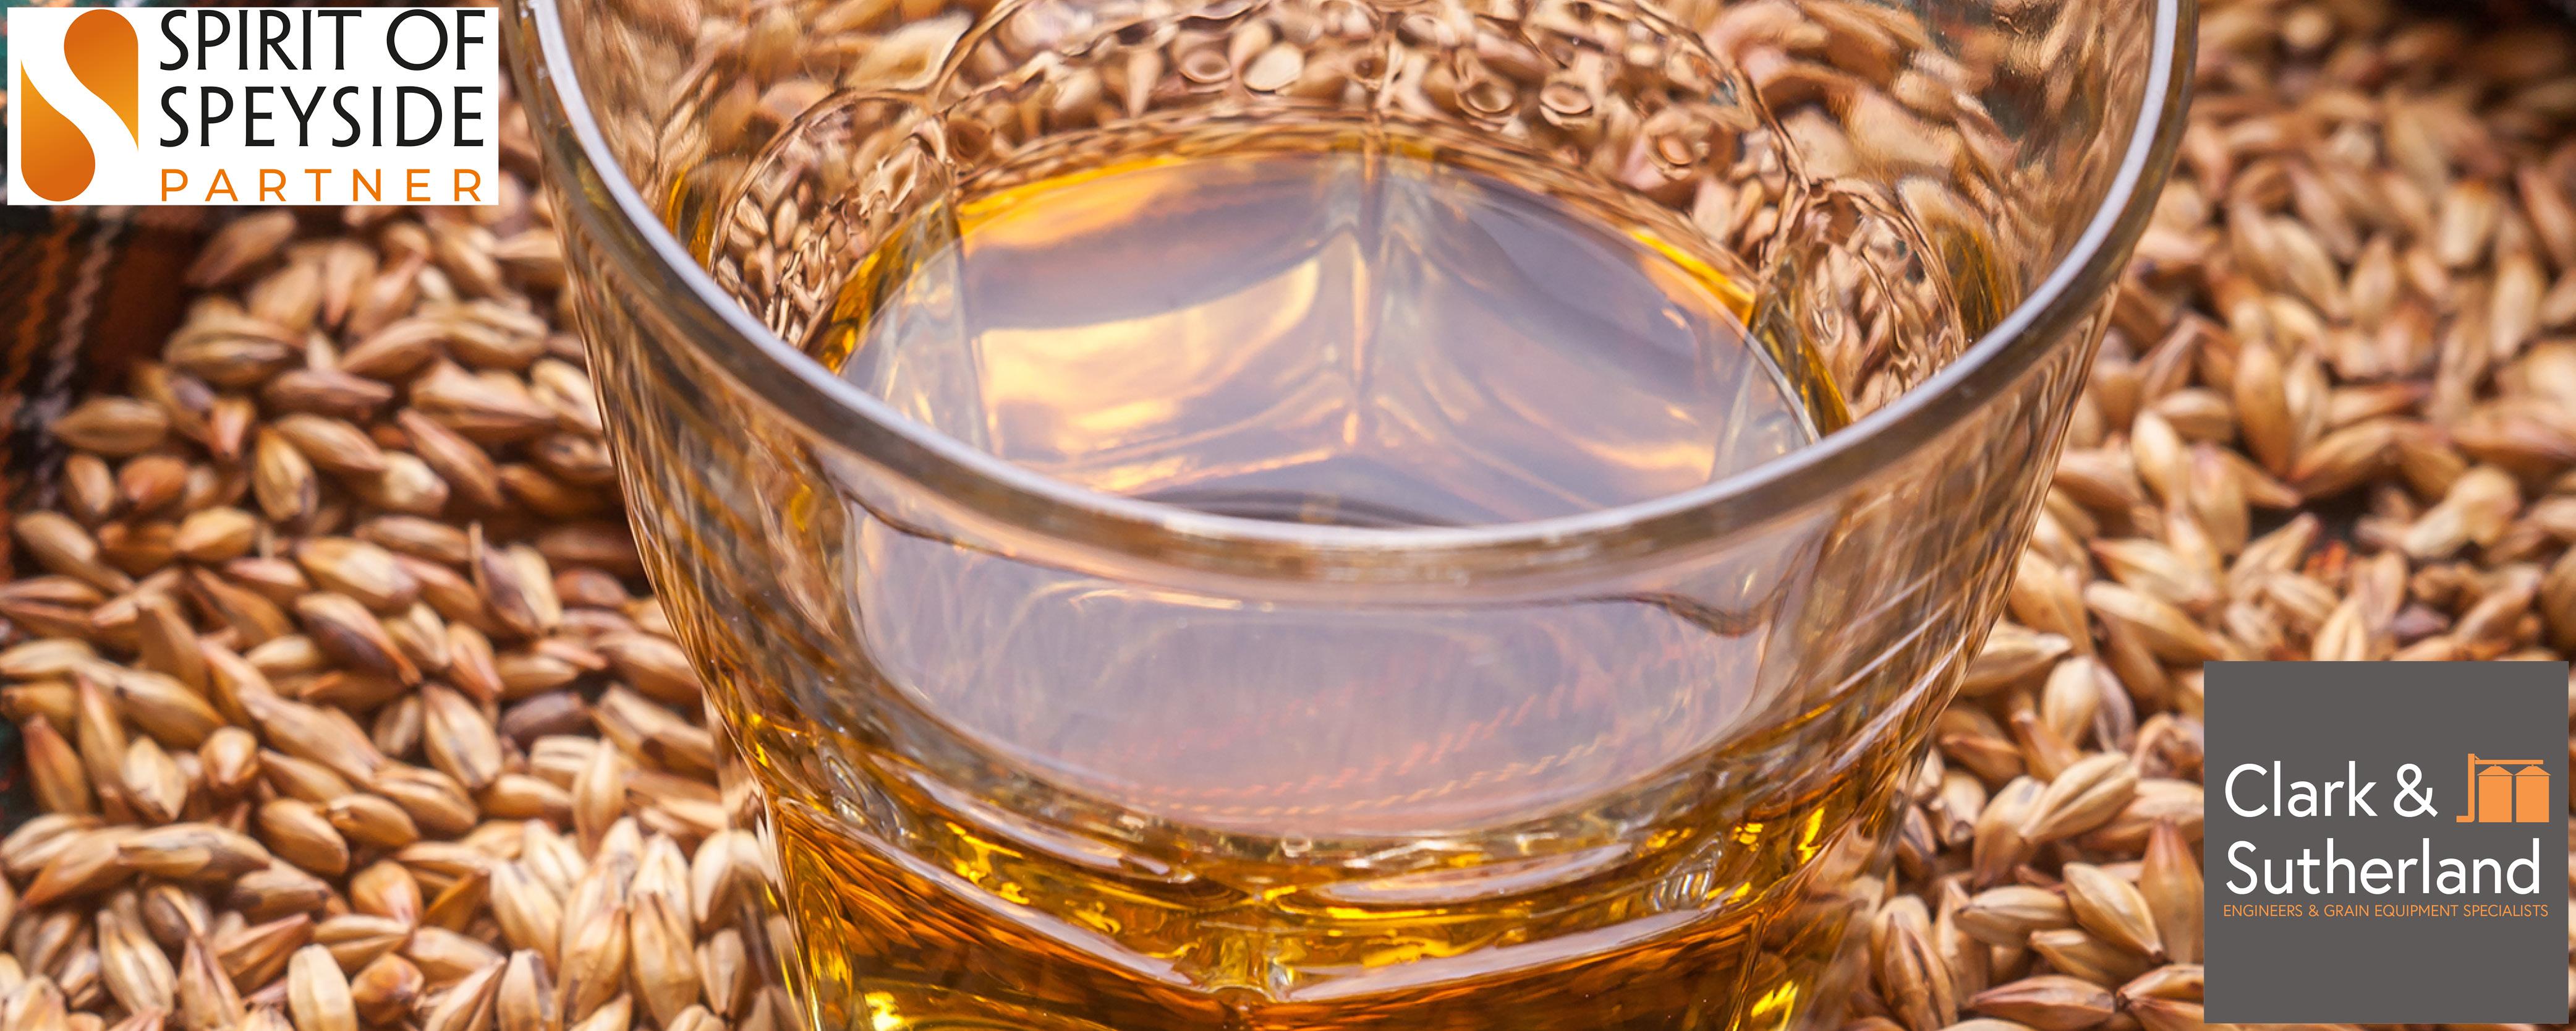 Close up of whisky glass sitting on malt